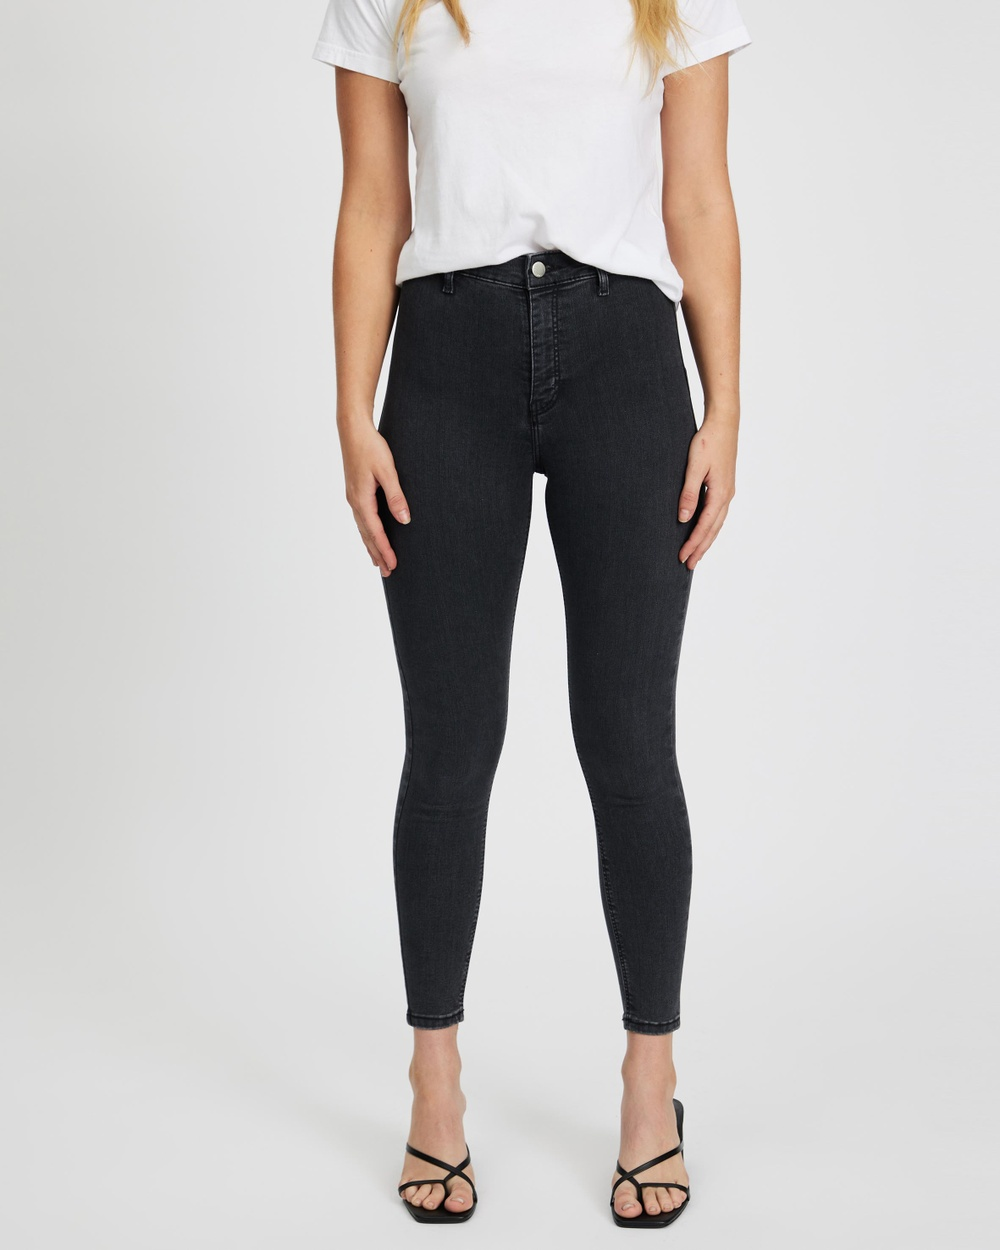 TOPSHOP Joni Jeans High-Waisted Washed Black Australia